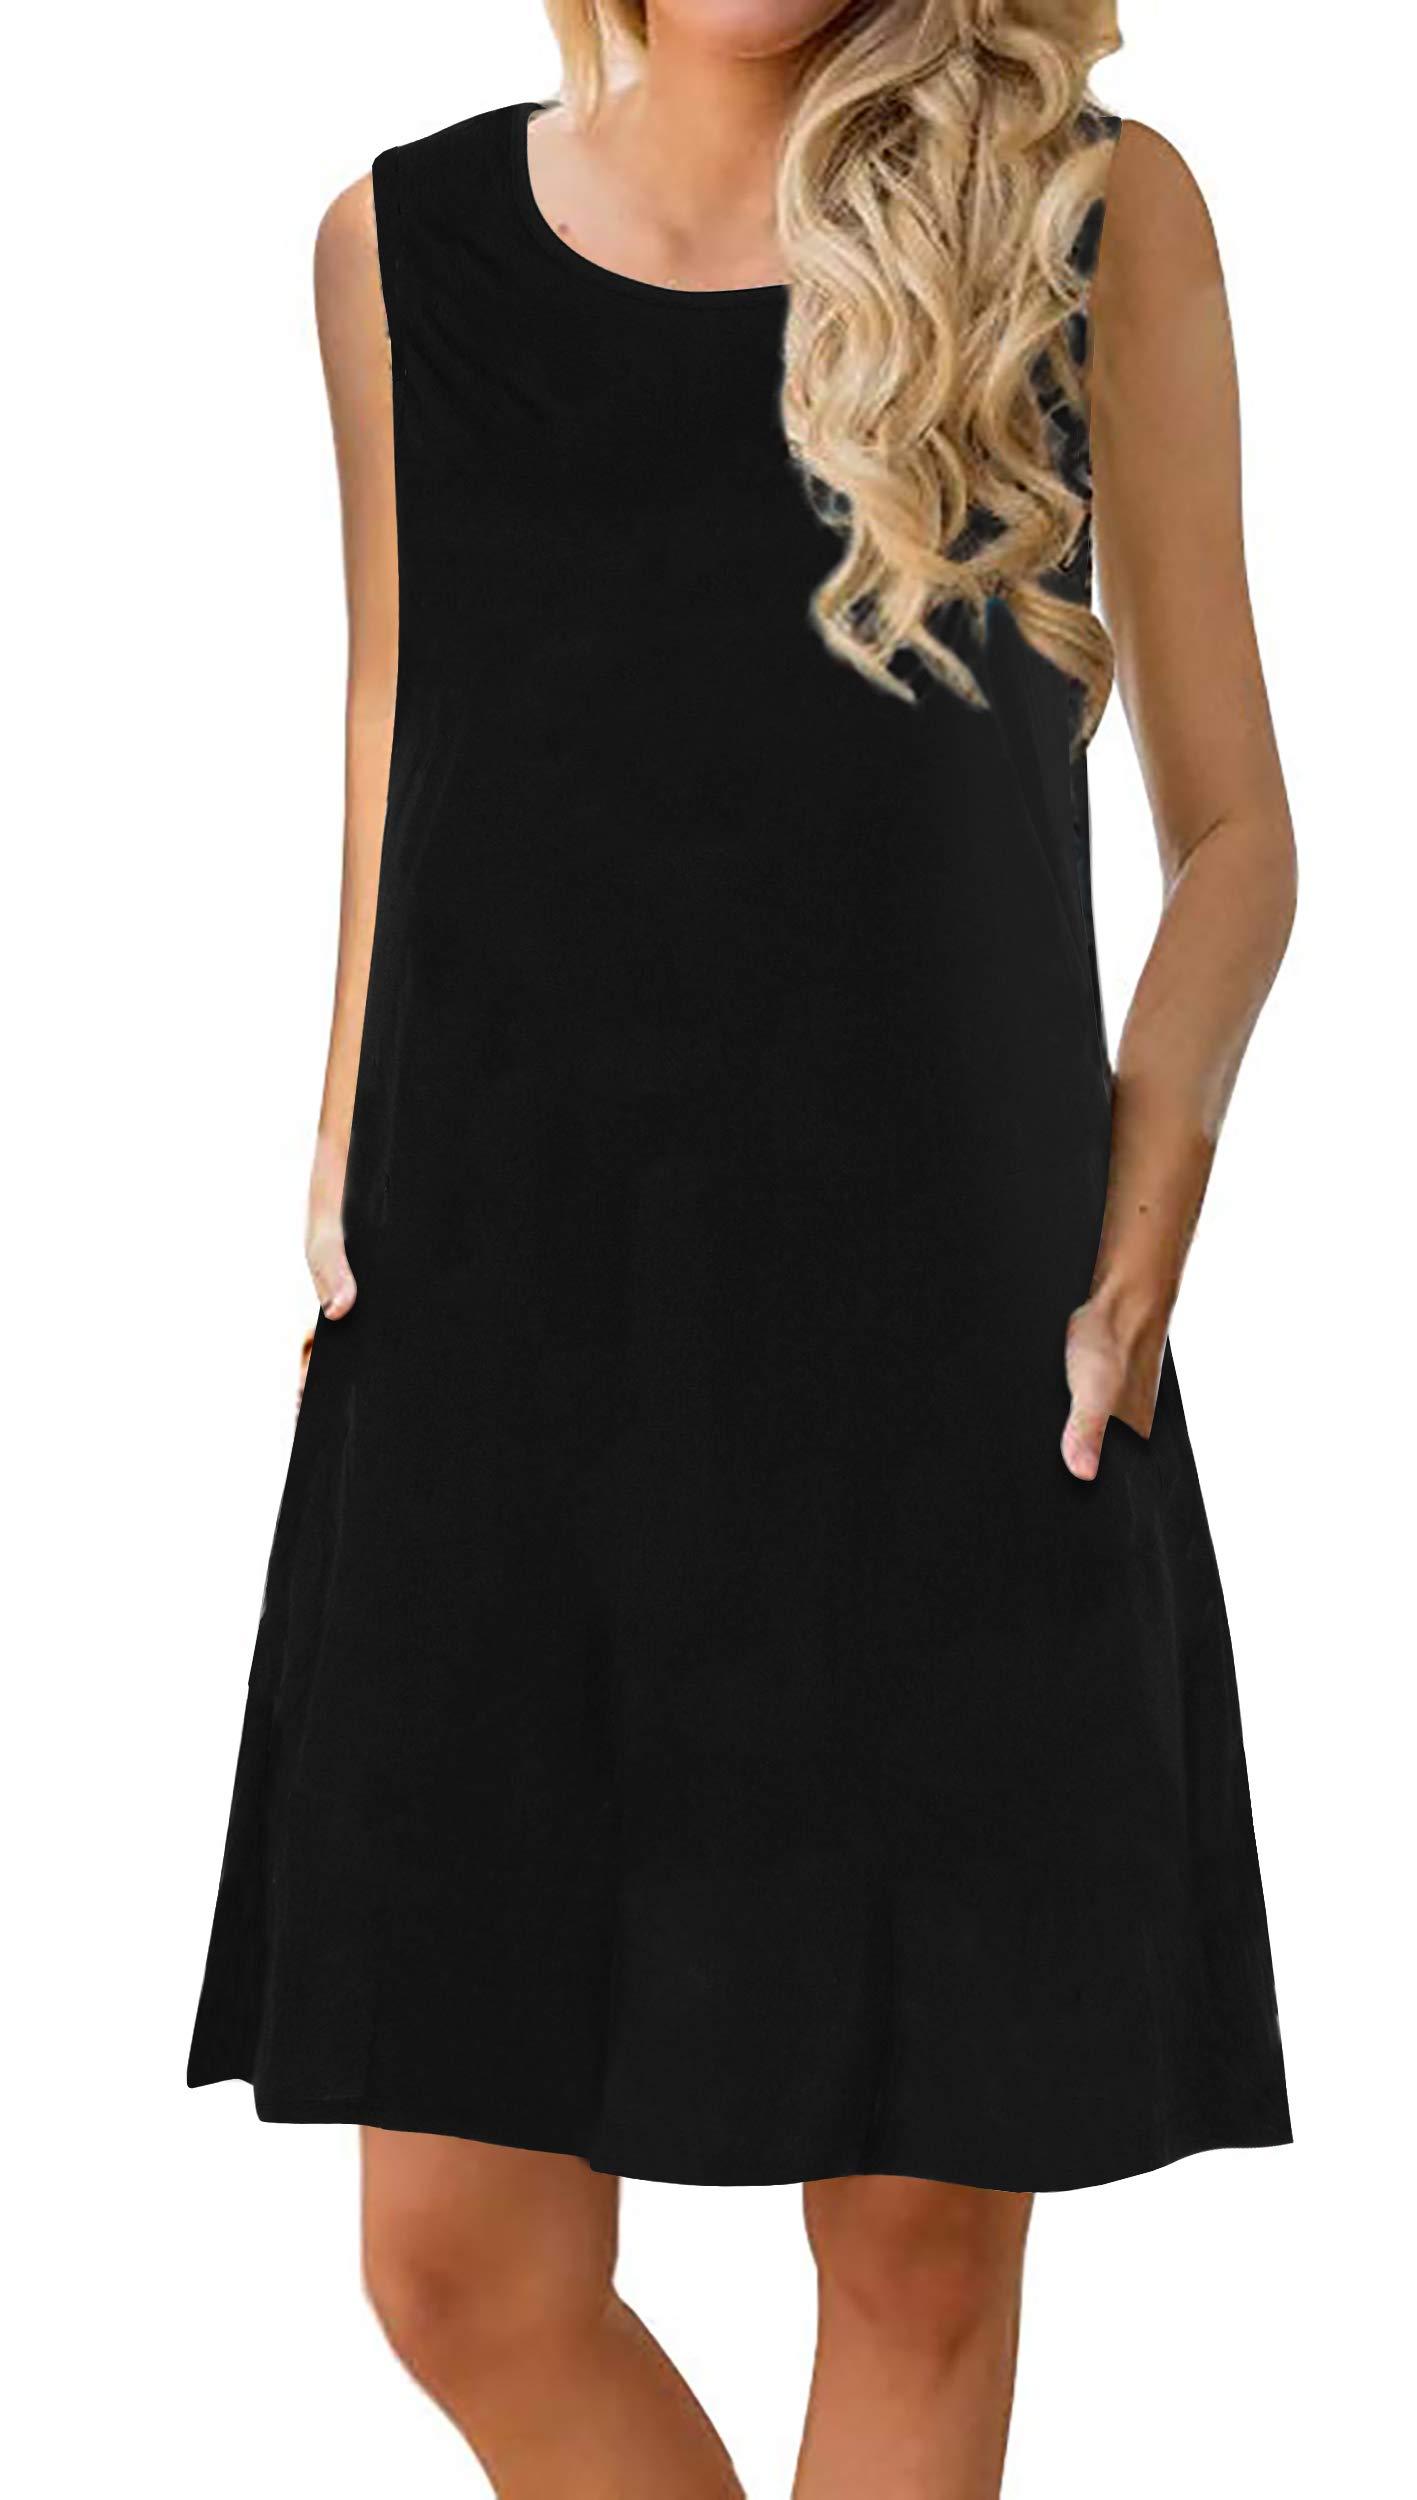 Manydress Women's Summer Casual Sleeveless Dress Floral Printed Swing Dress T-Shirt Dress Sundress with Pockets MY028 (Black, S)